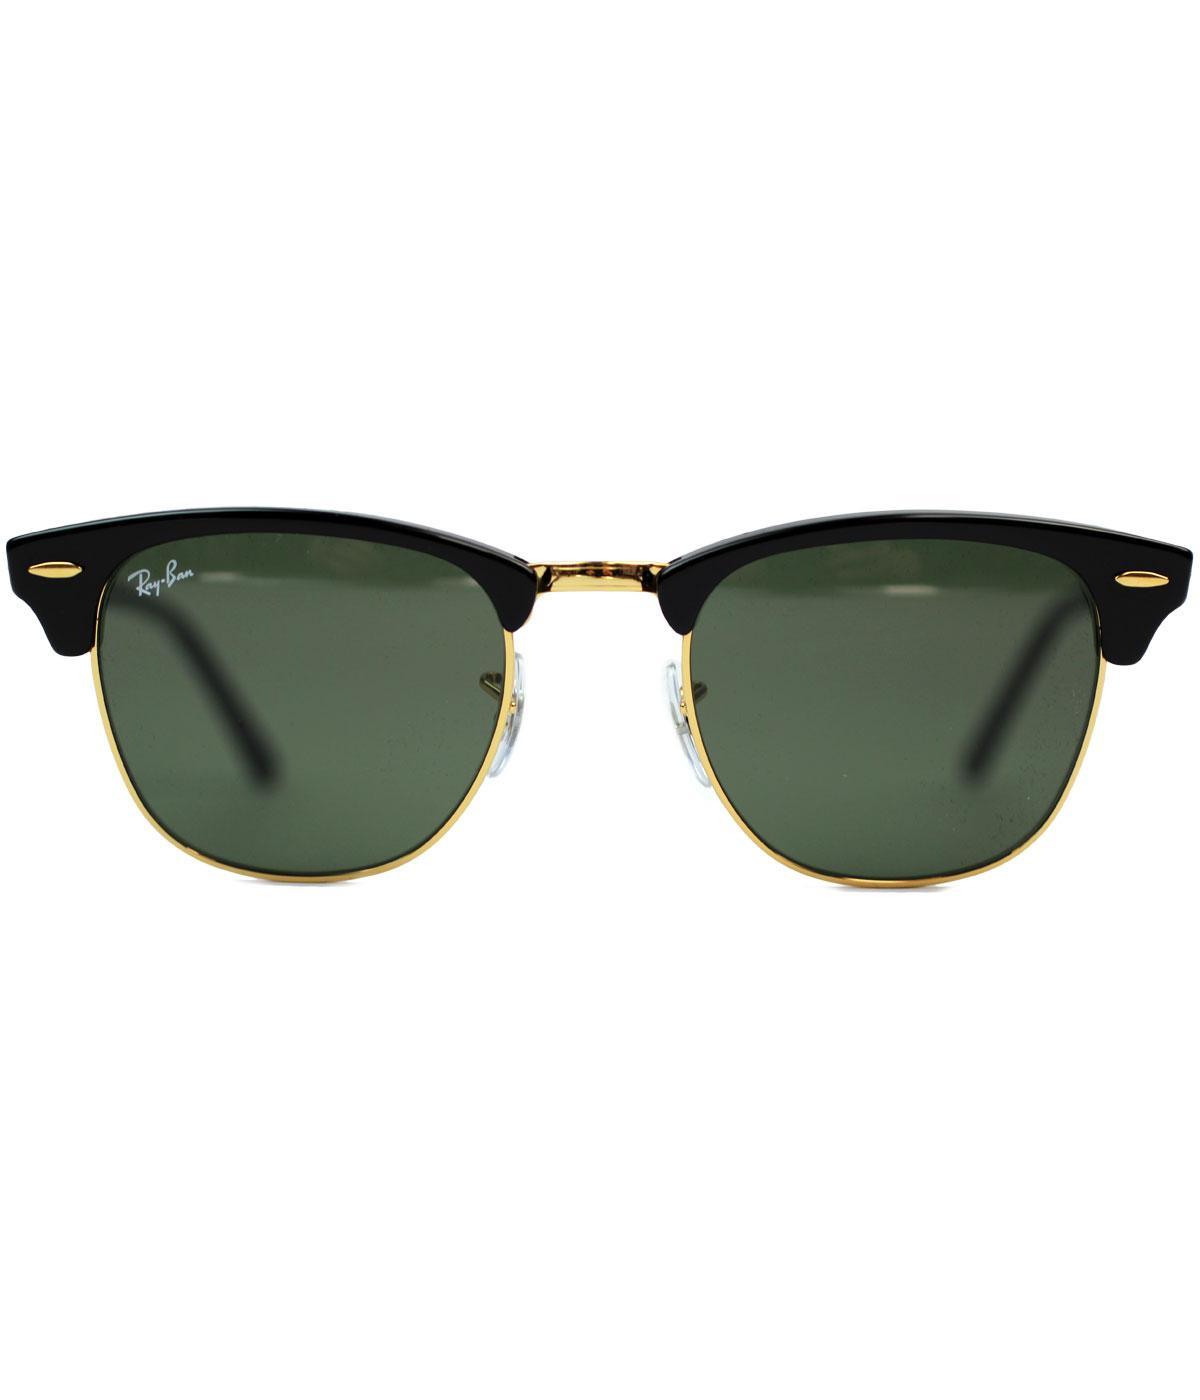 Clubmaster RAY-BAN Icons Retro Mod 60s Sunglasses